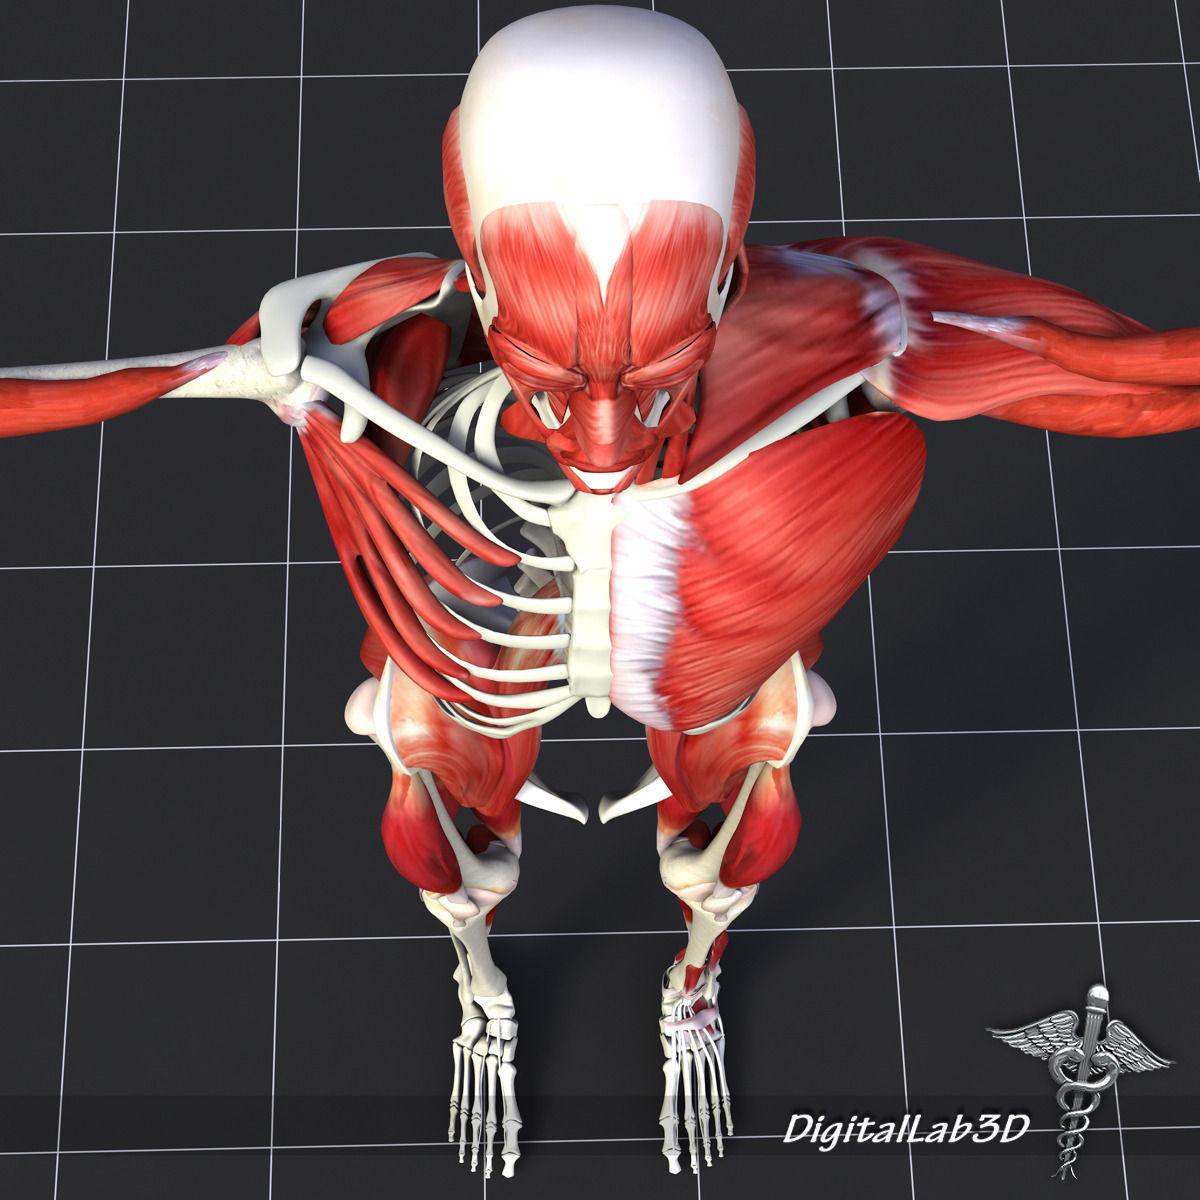 Human Muscle And Bone Structure 3d Model Max 3ds Fbx C4d